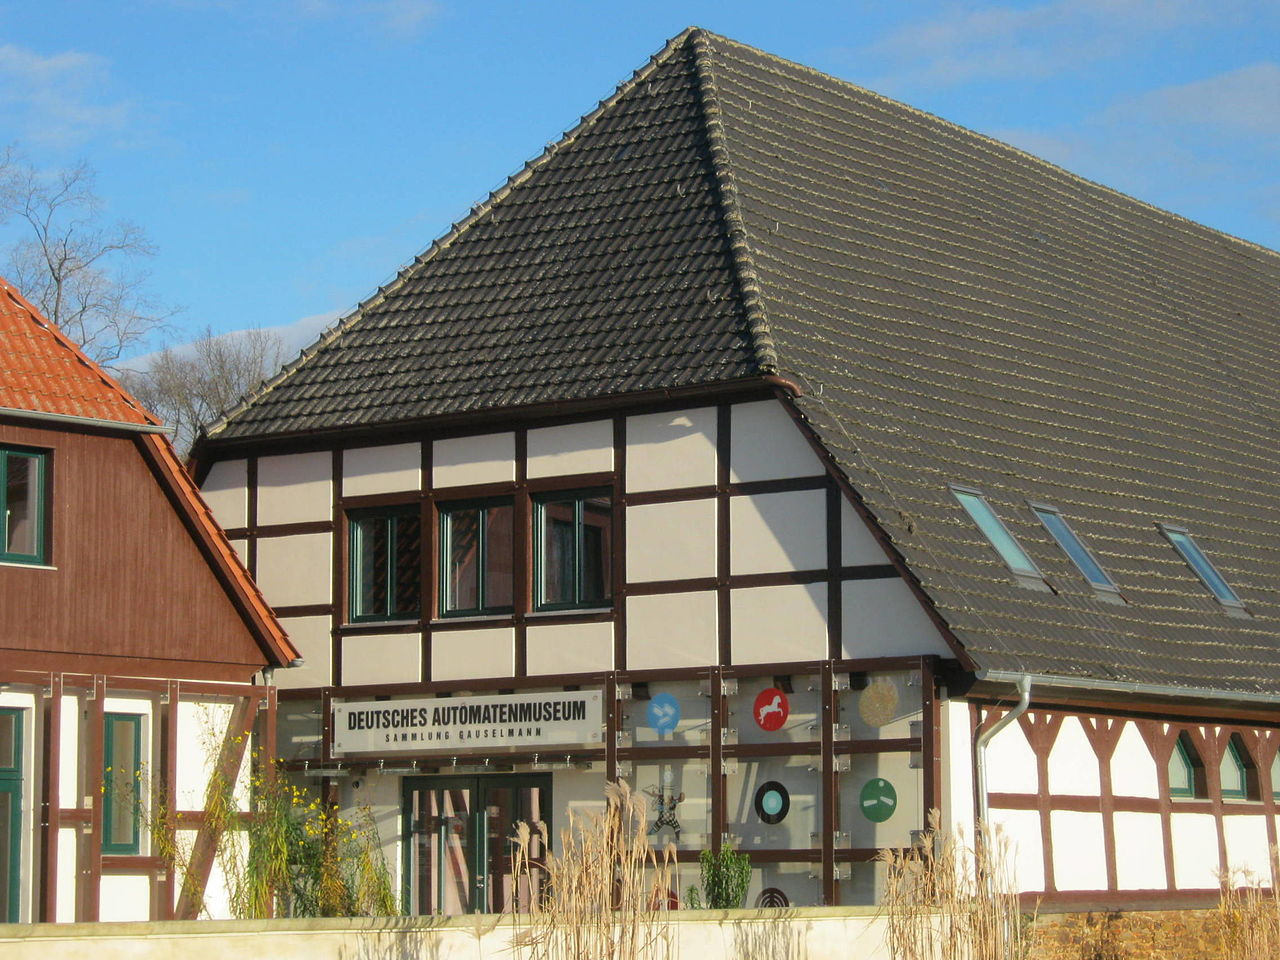 Bild Deutsches Automatenmuseum Espelkamp